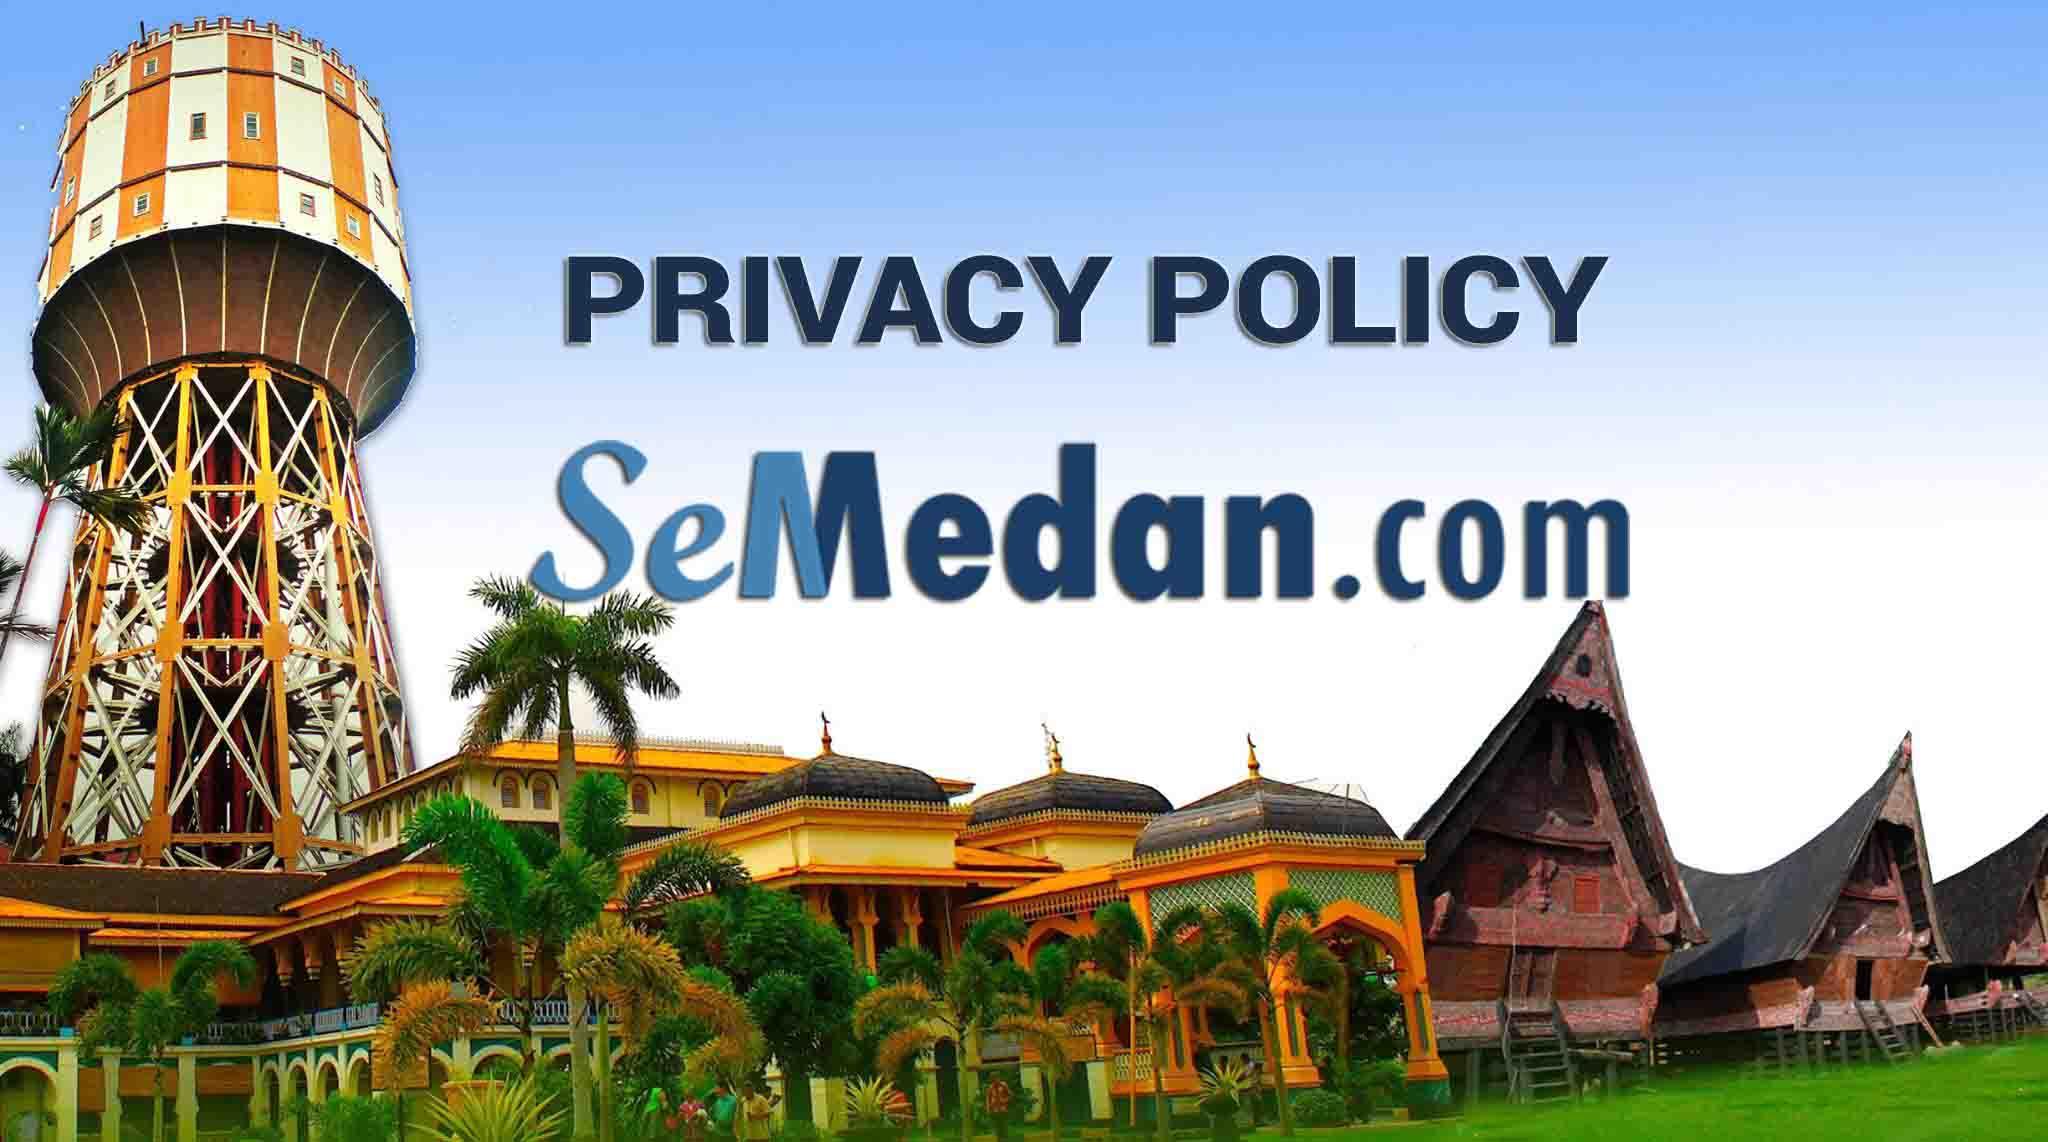 privacy policy semedan.com